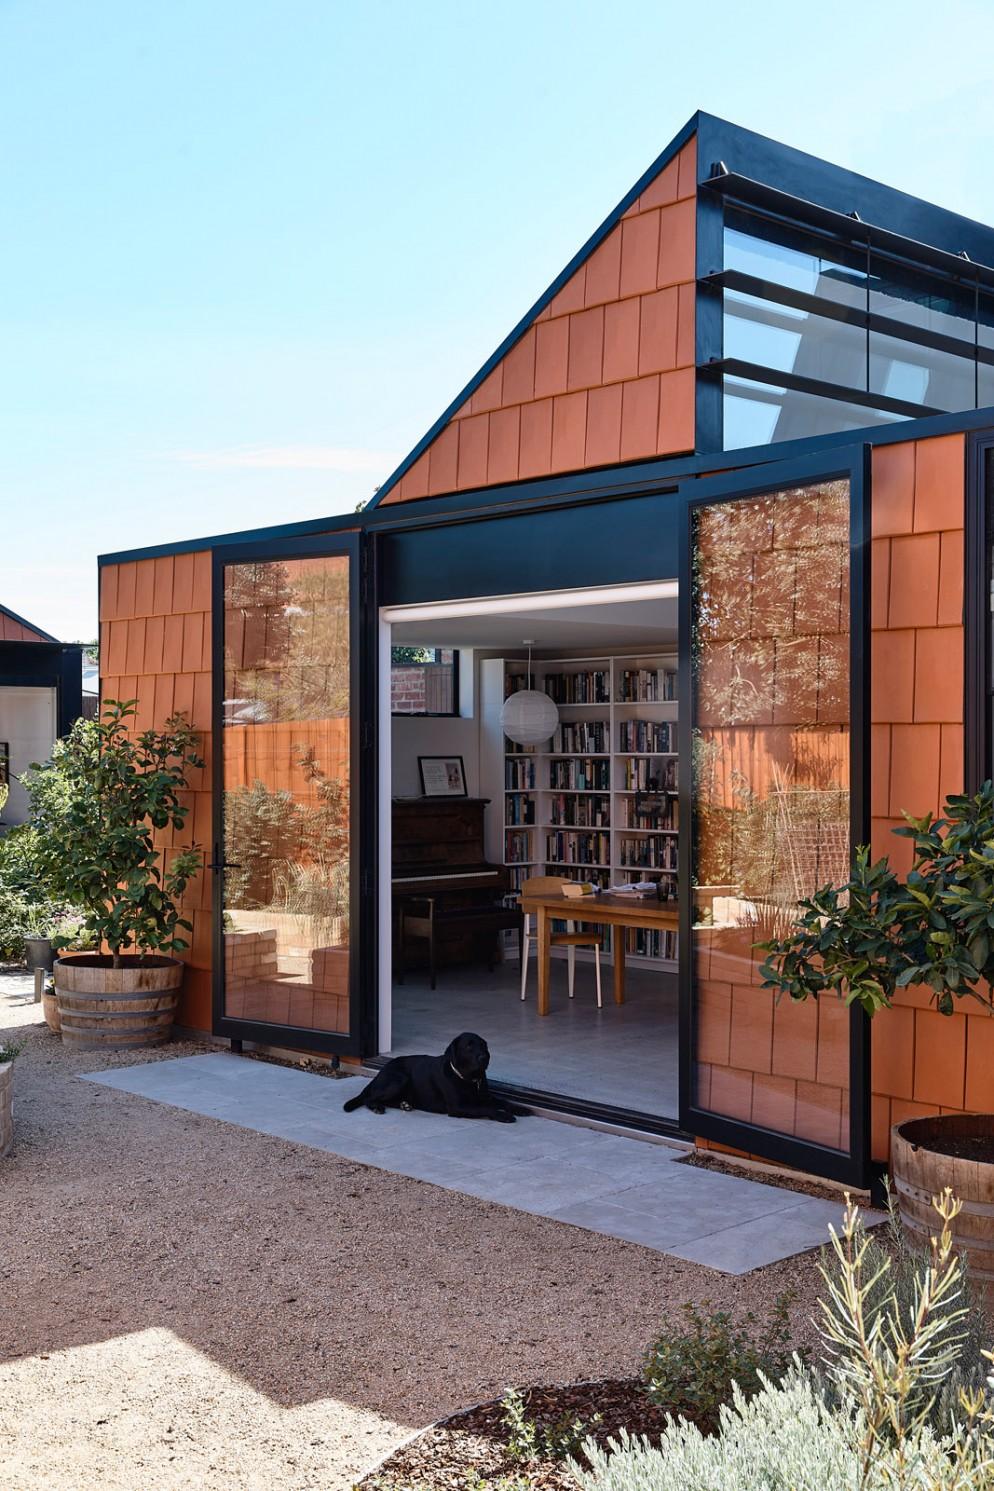 16 AMA-Terracotta_House_Derek_Swalwell